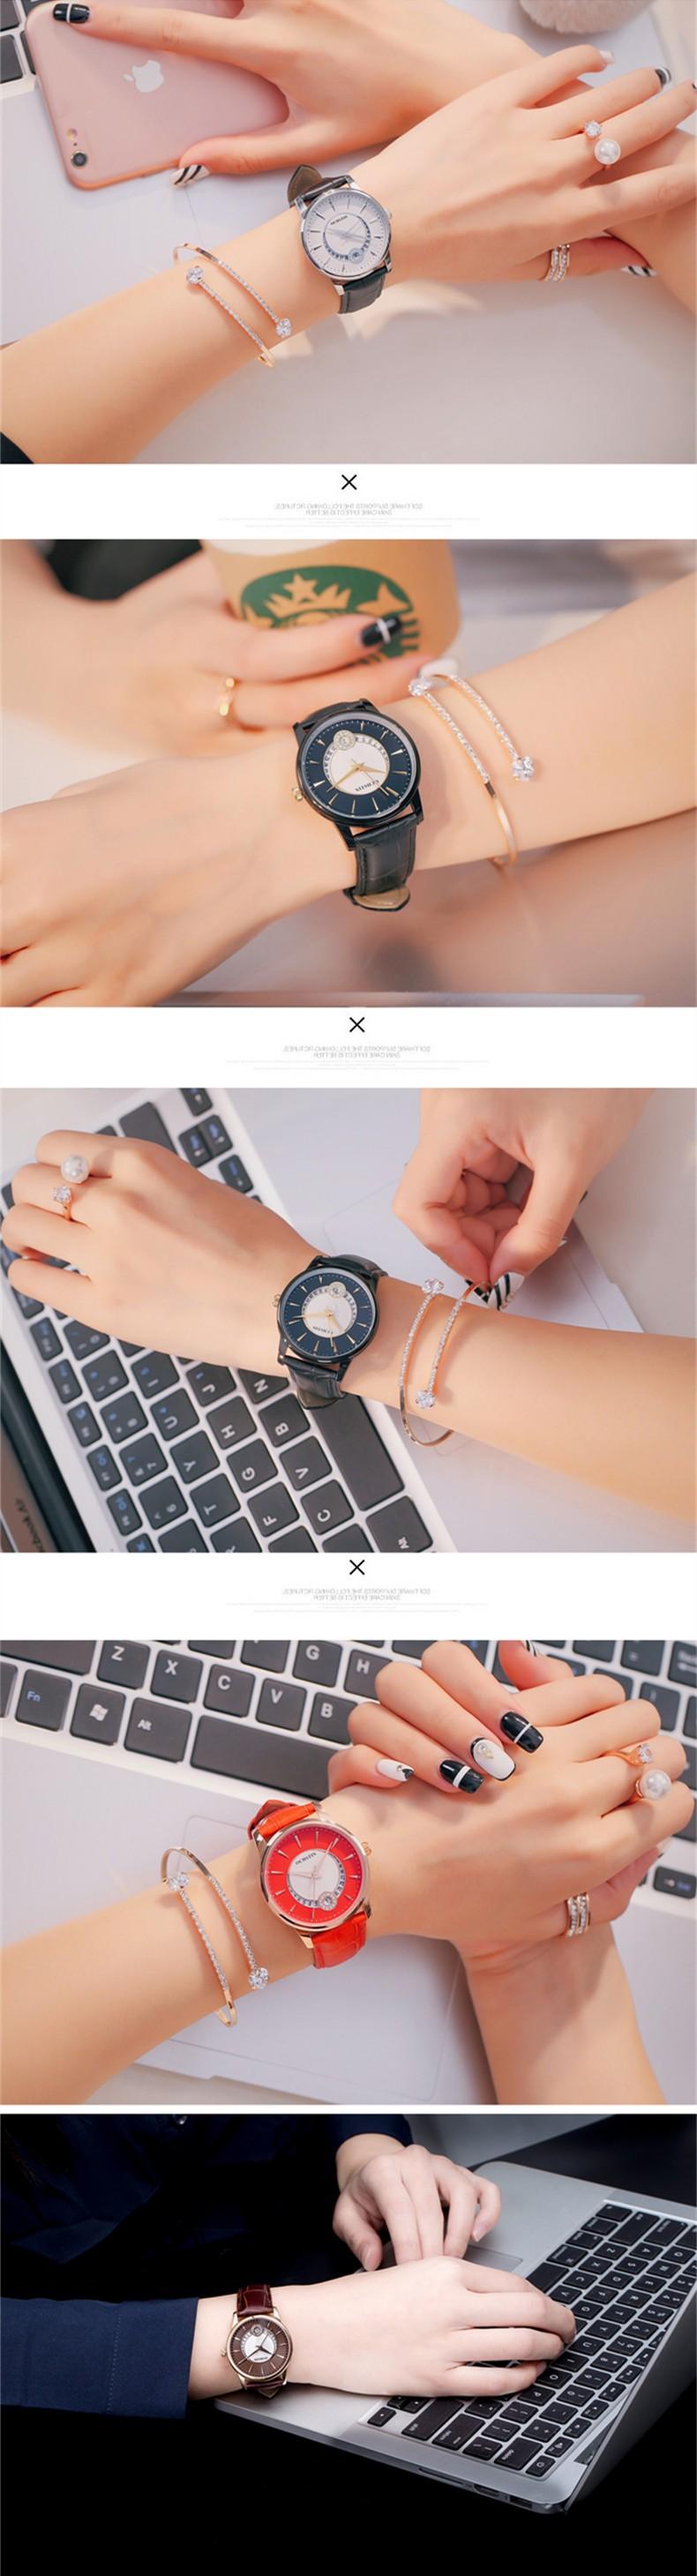 Ochstin Limited Часы Известных Брендов Женщины 2016 Мода Кварцевые Часы Женщины Элегантное Платье Relógio Feminino Часы Montre Femme